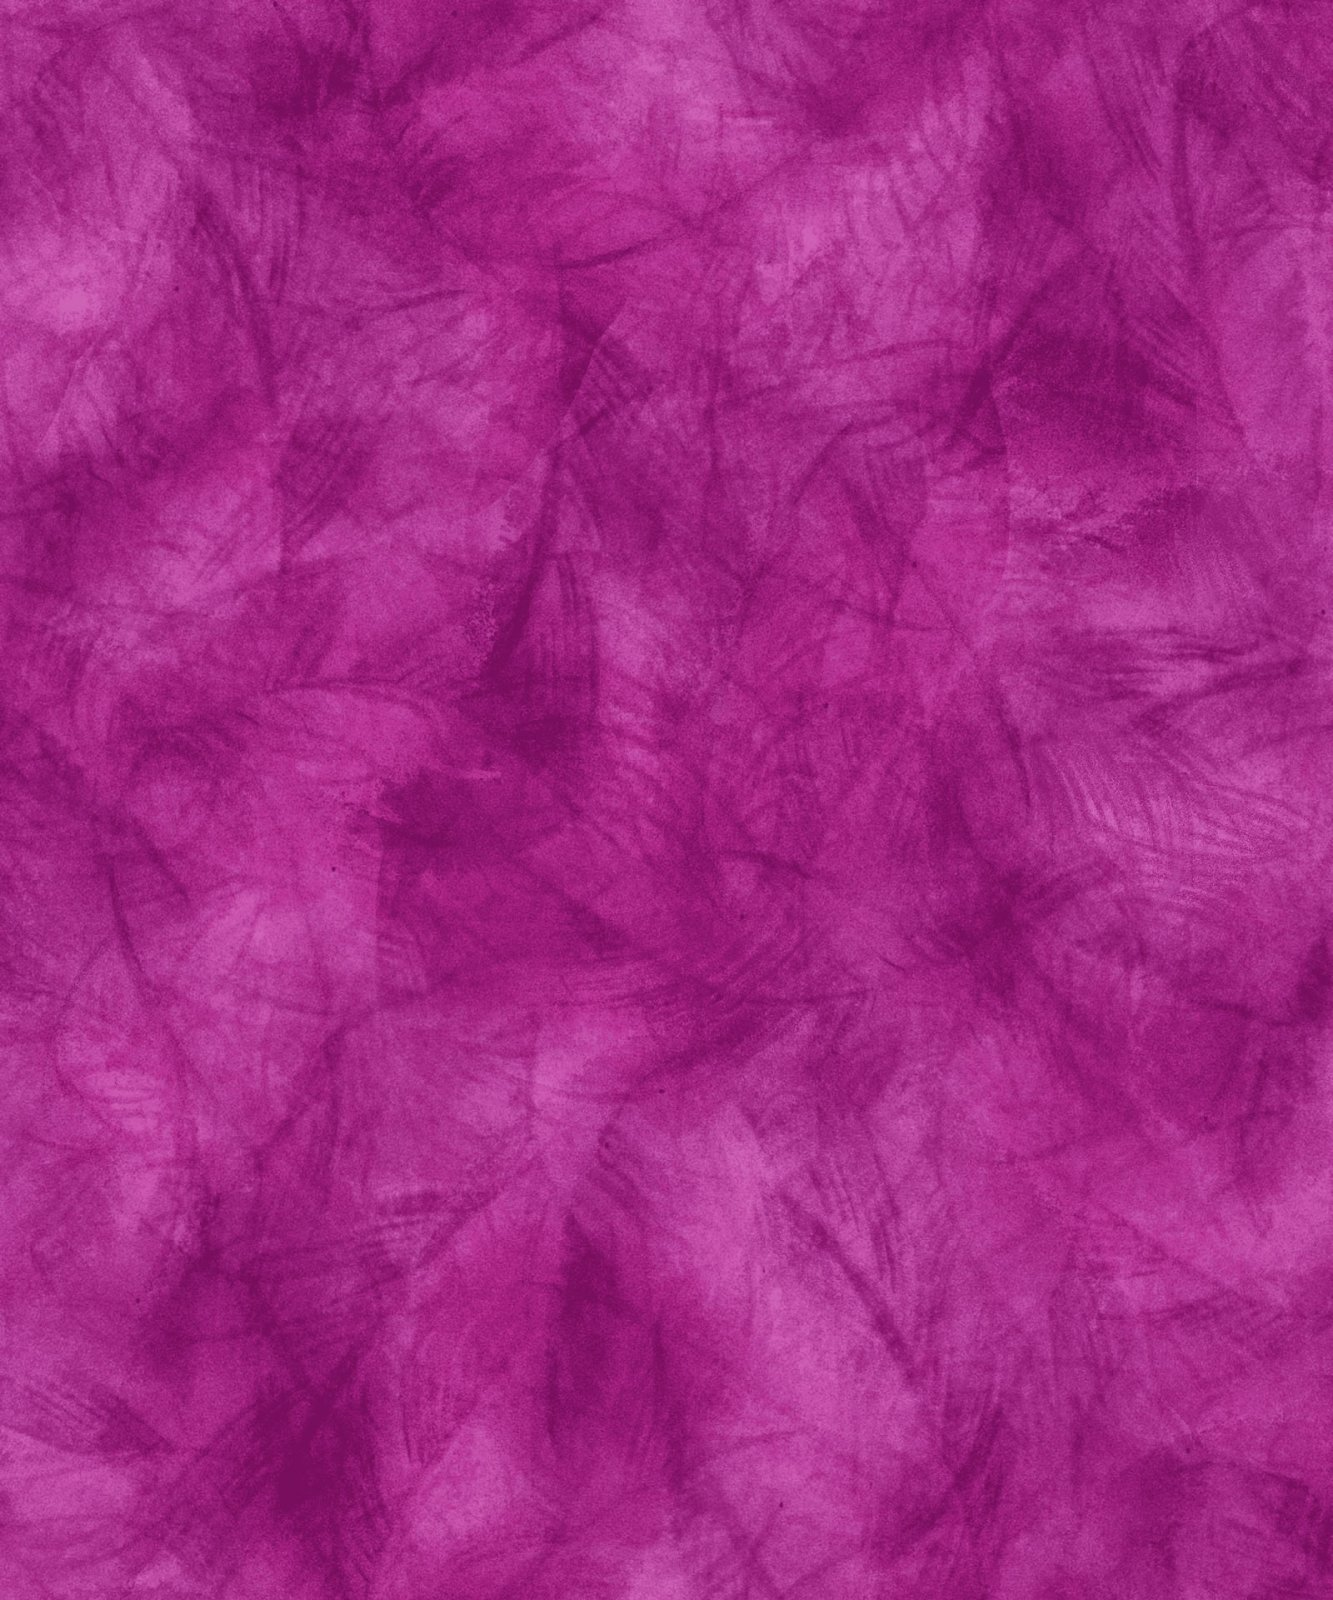 Etchings - Fuchsia 118 wide